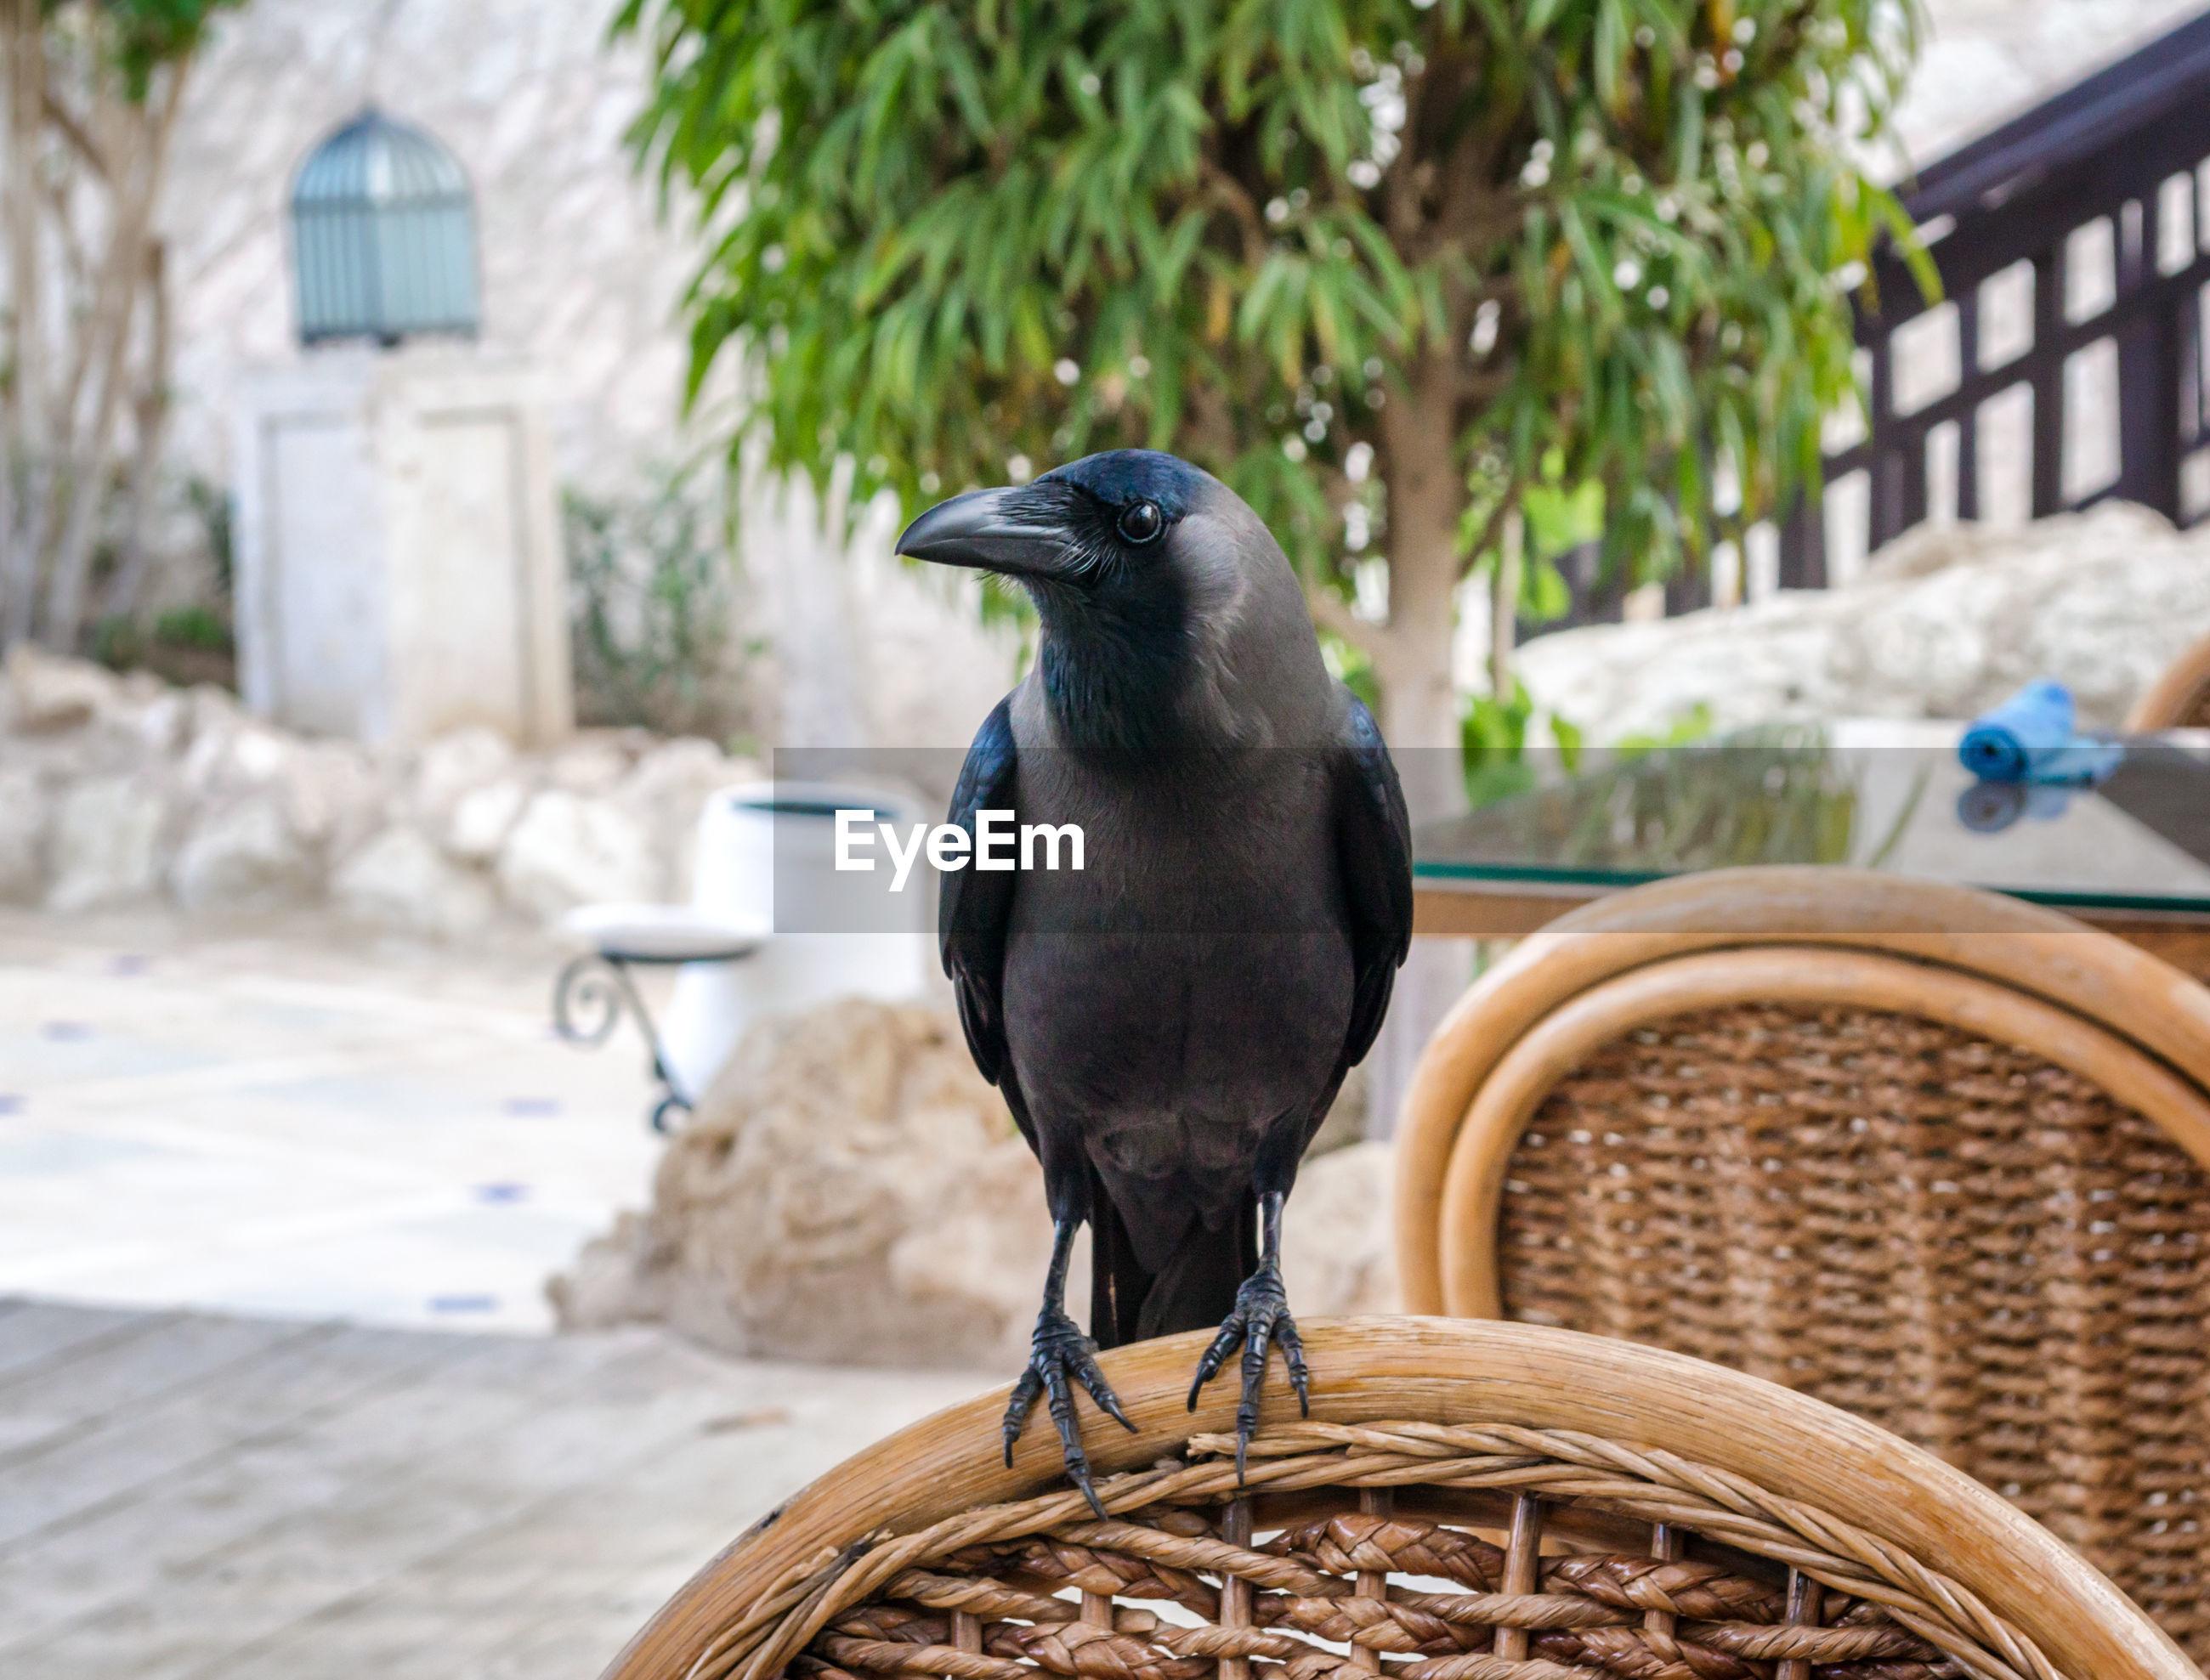 CLOSE-UP OF BIRD PERCHING ON A BASKET